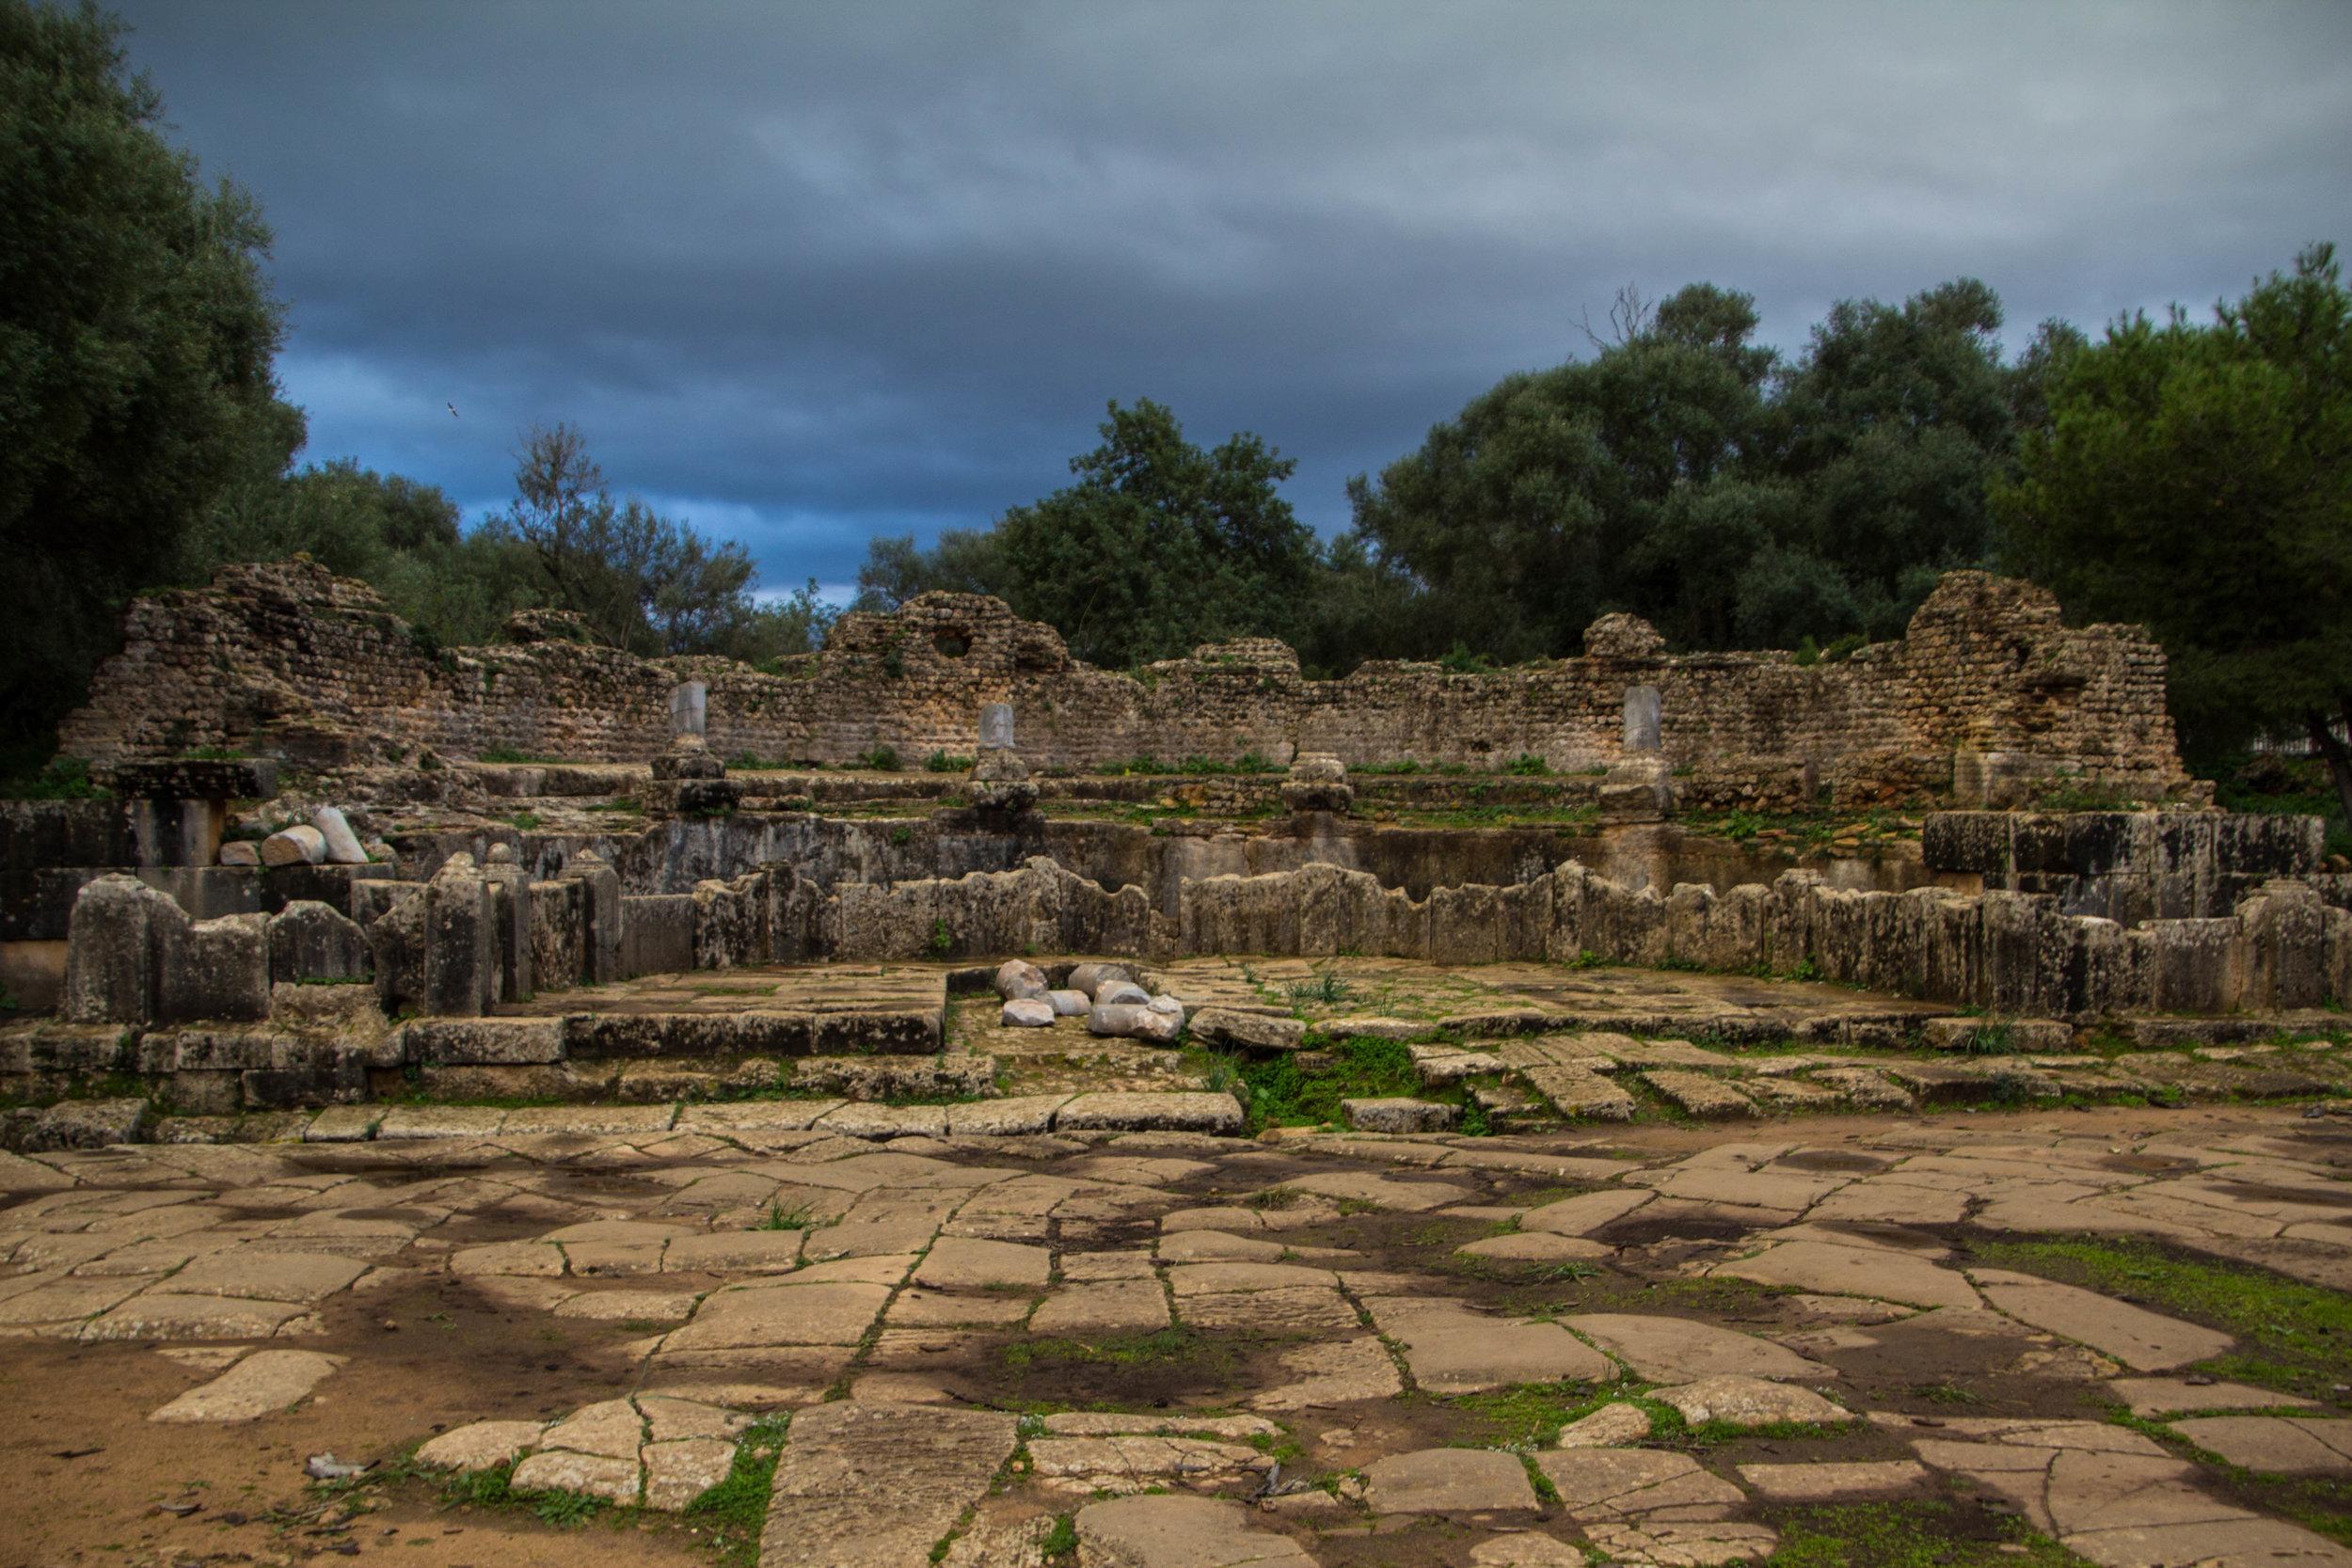 tipiza-roman-ruins-algeria-51.jpg